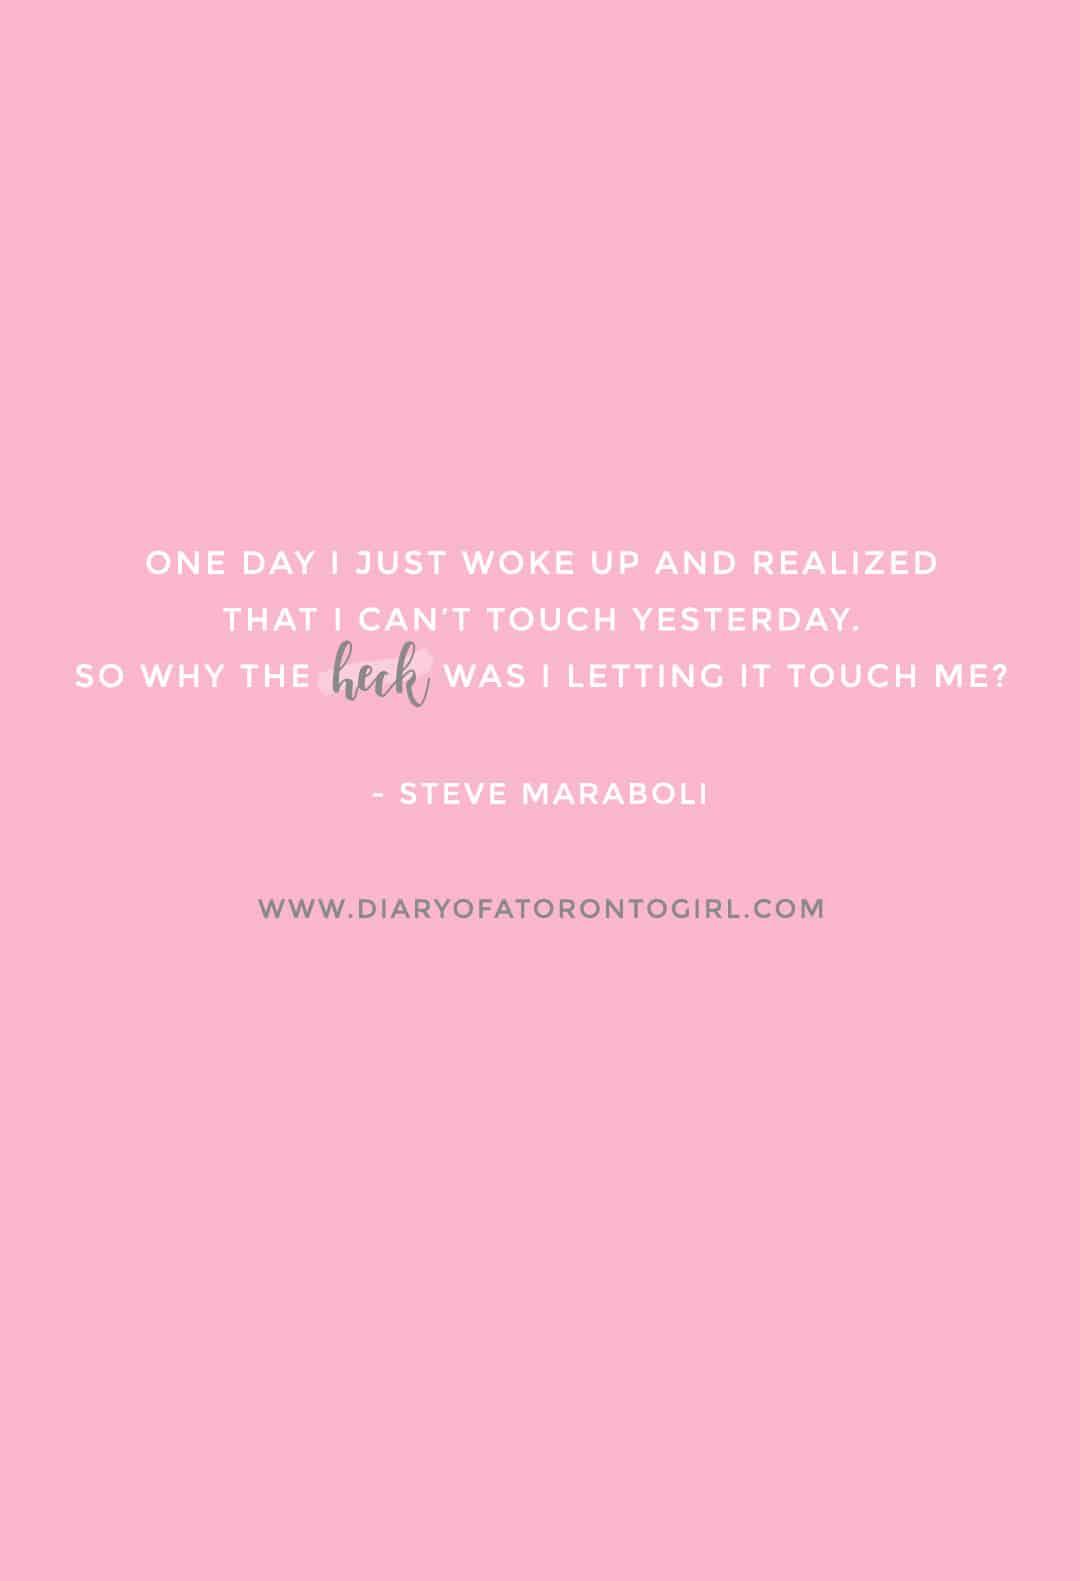 Steve Maraboli inspirational quote